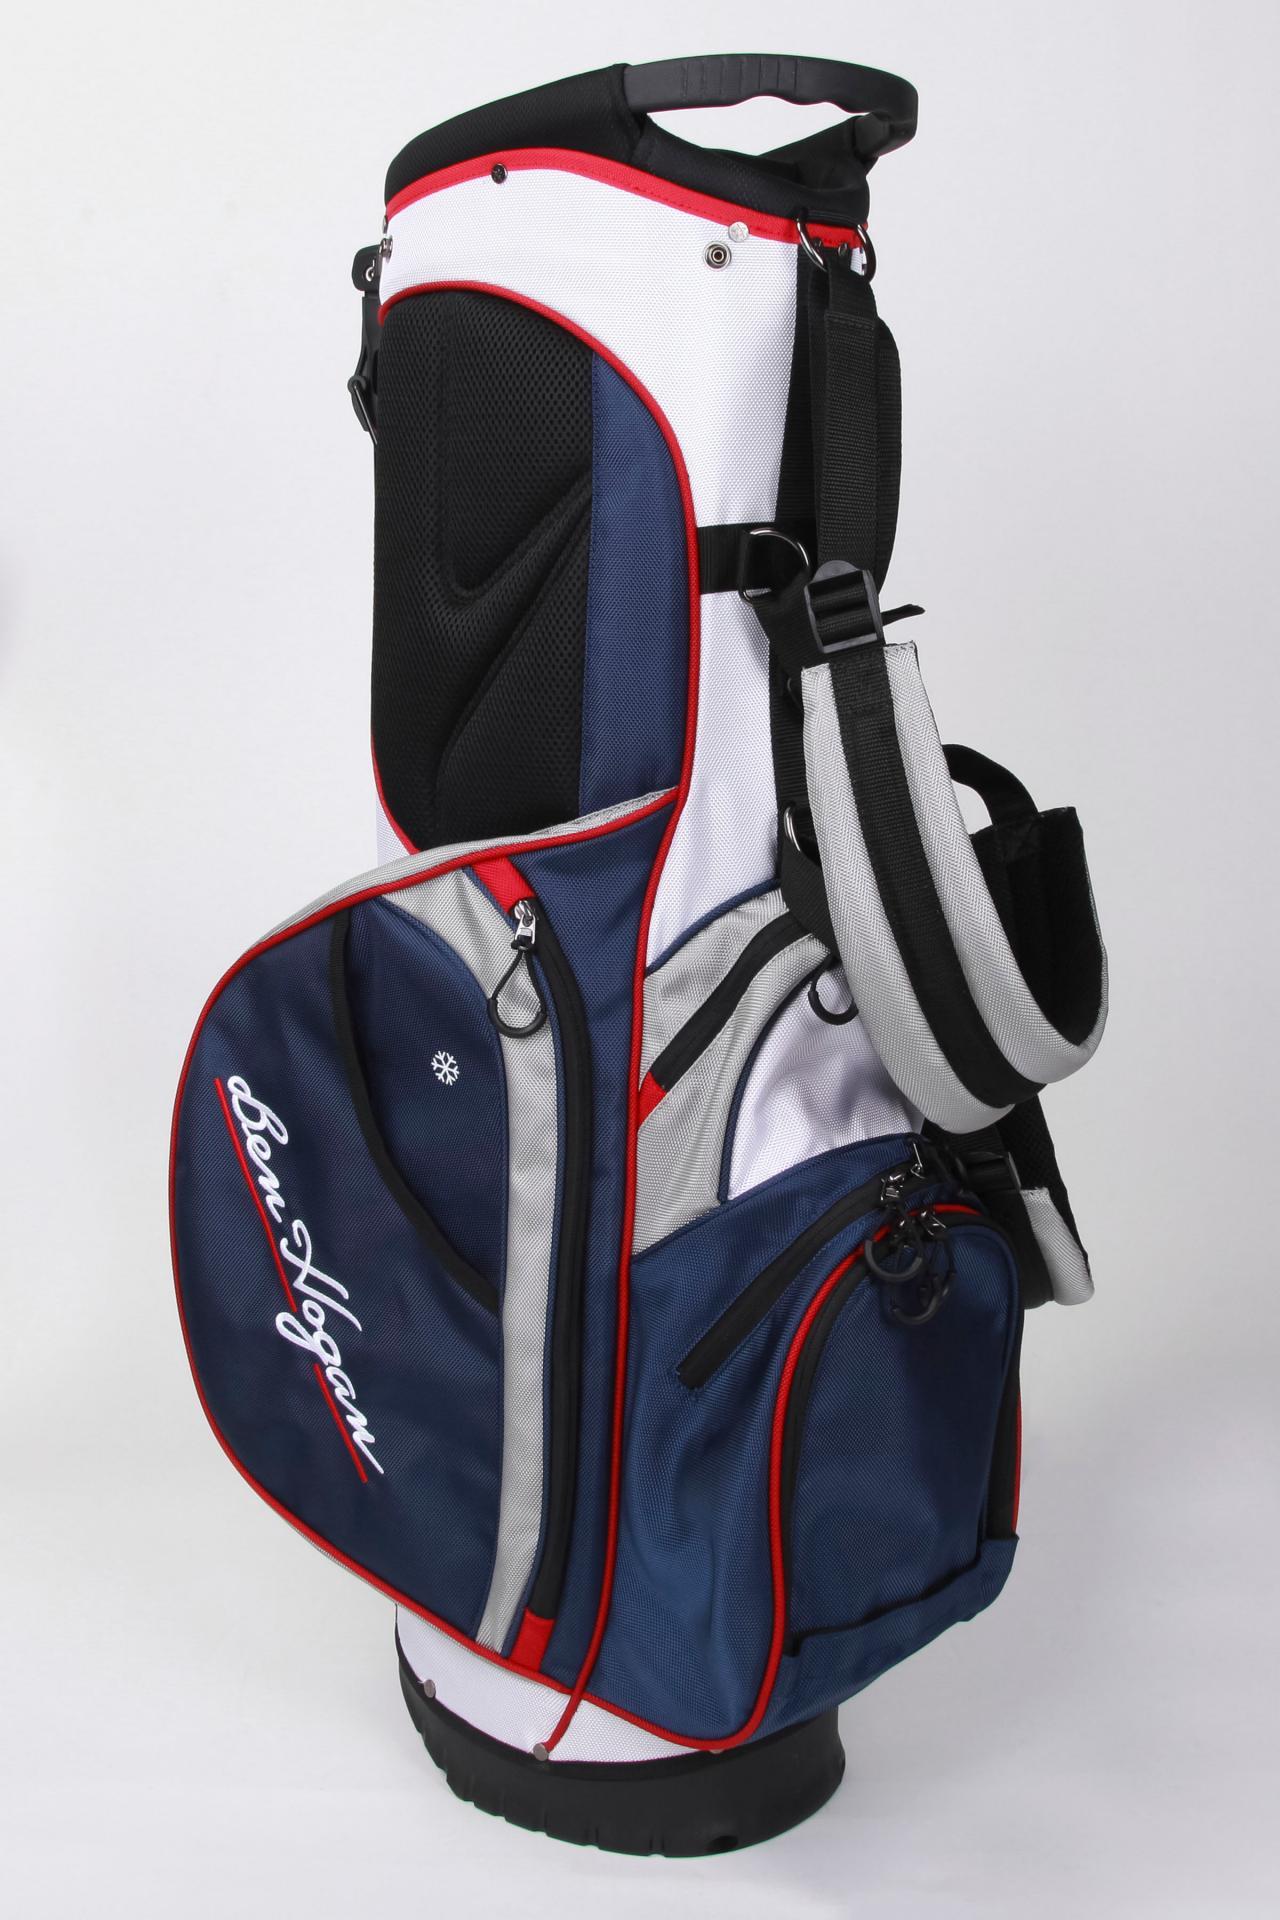 Ben Hogan Brand Adds Golf Bags To Its